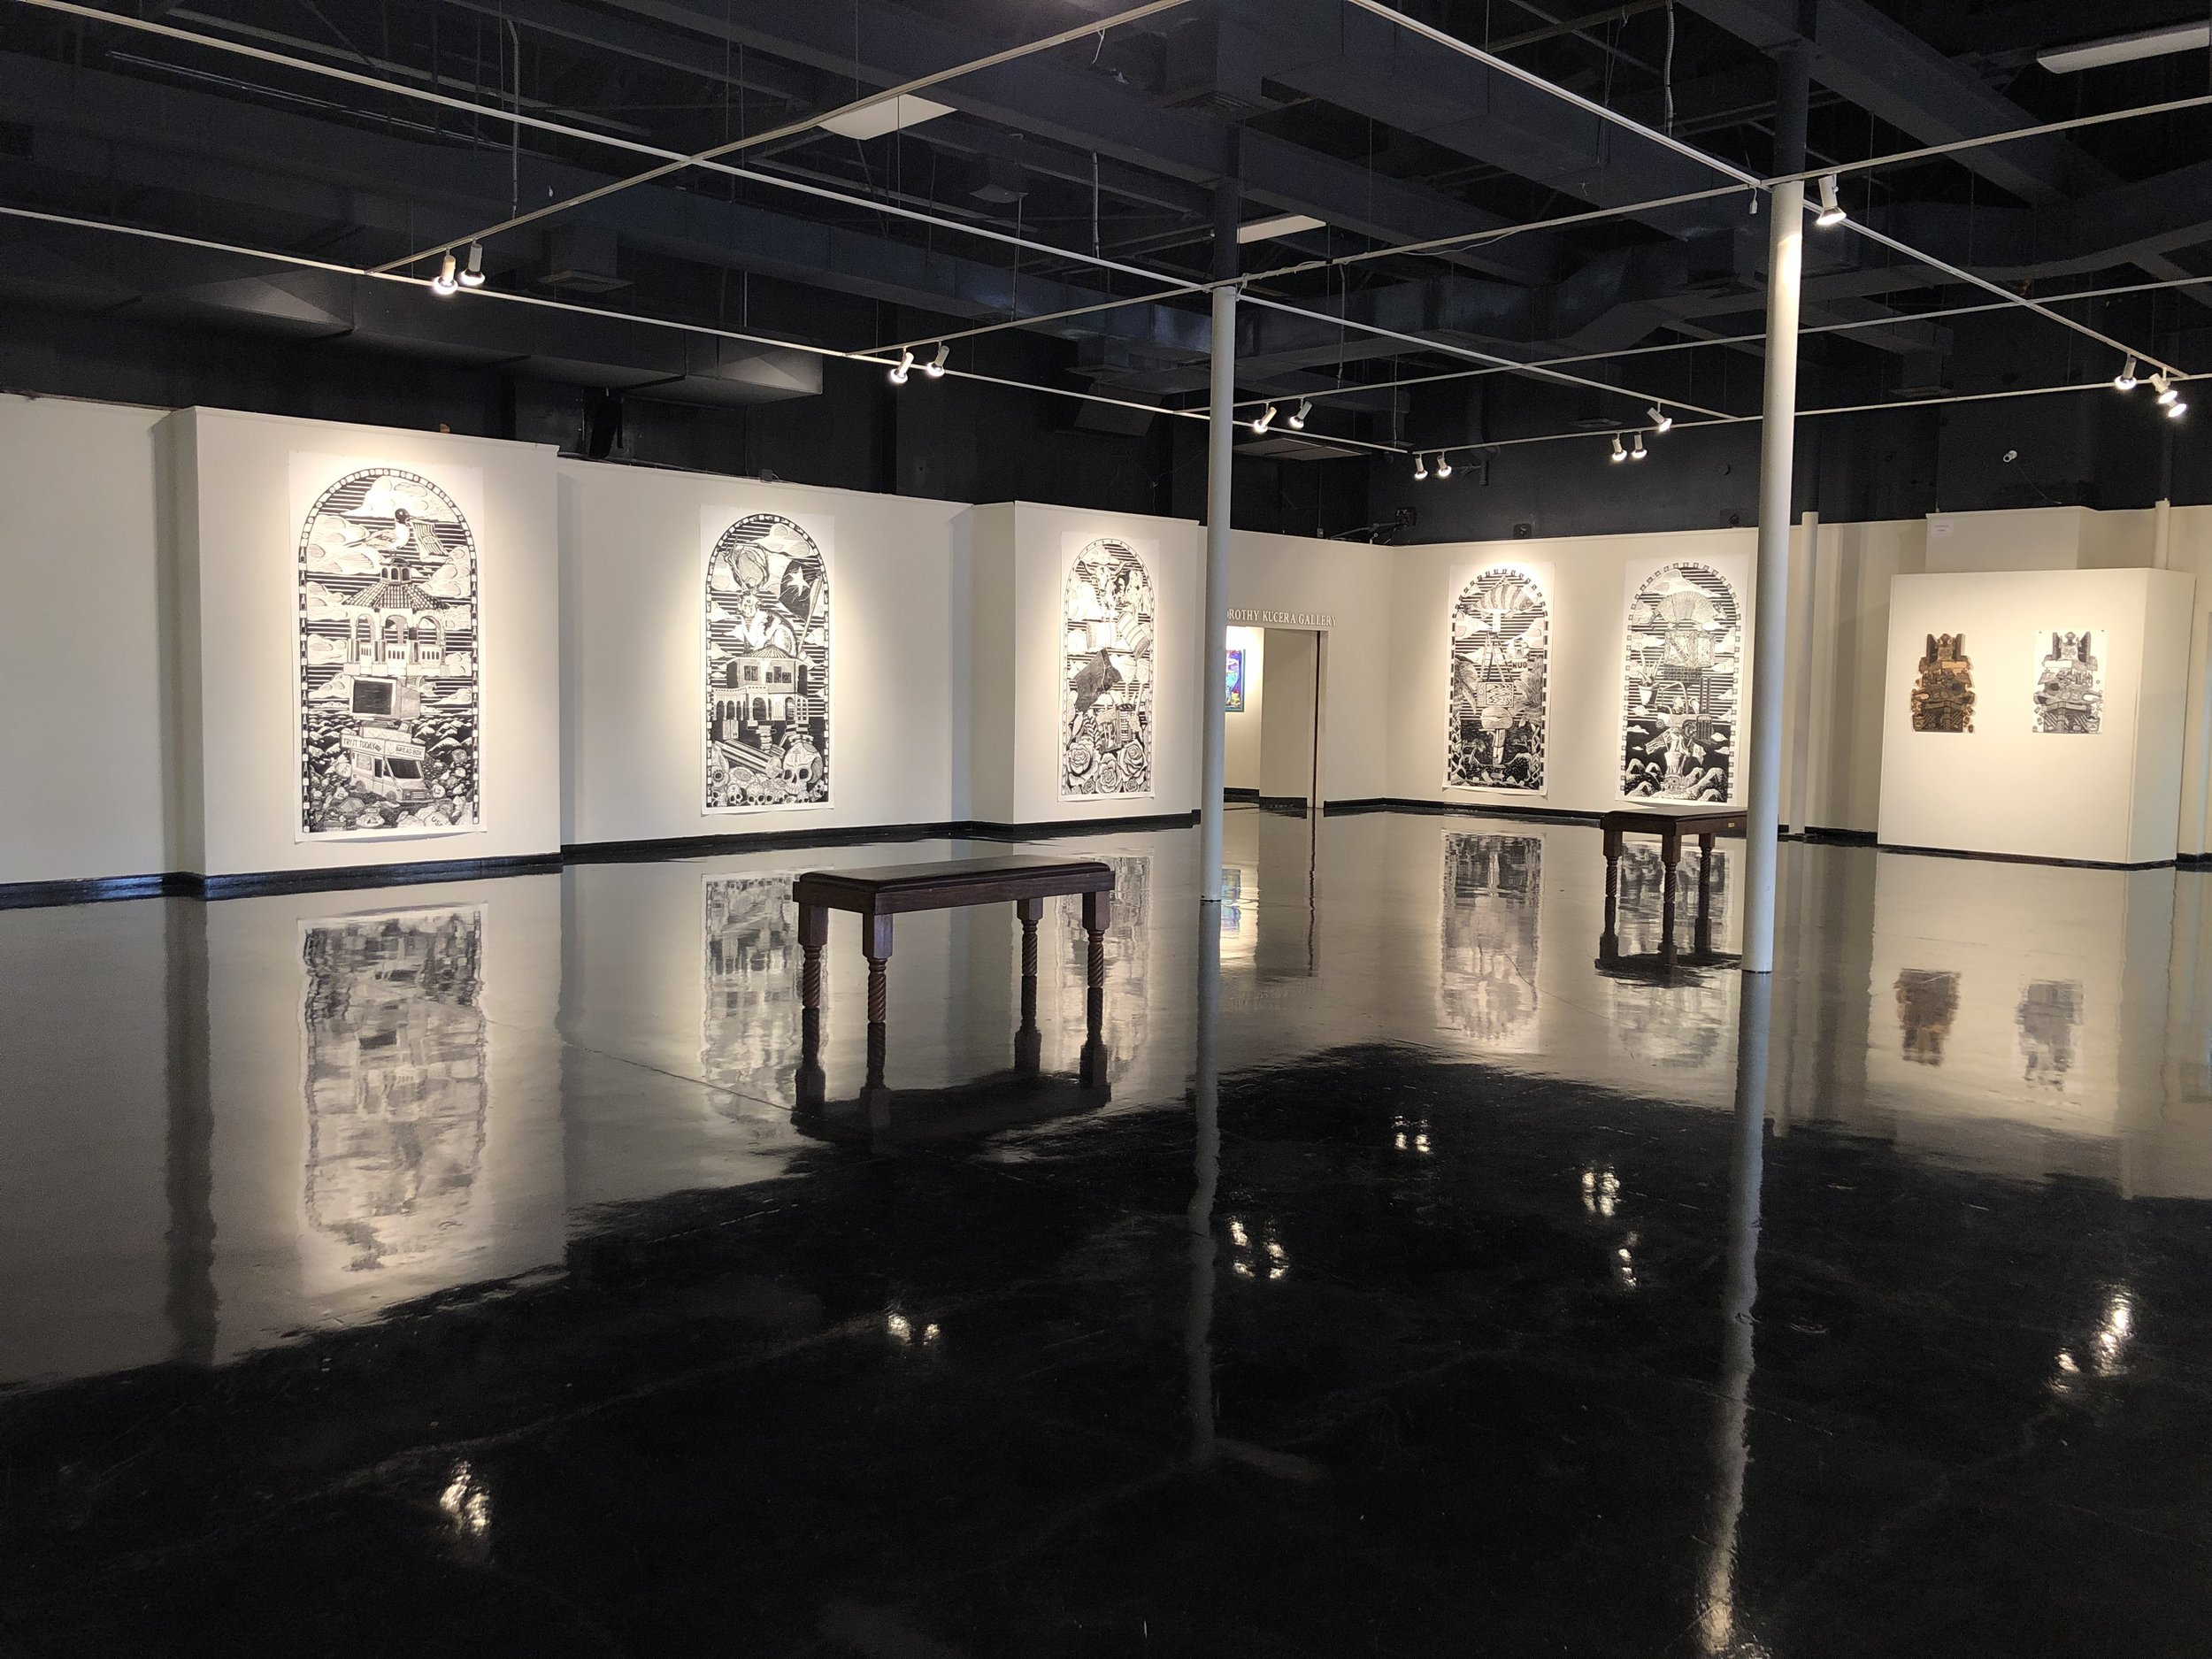 Art Center of Corpus Christi. Corpus Christi, Texas